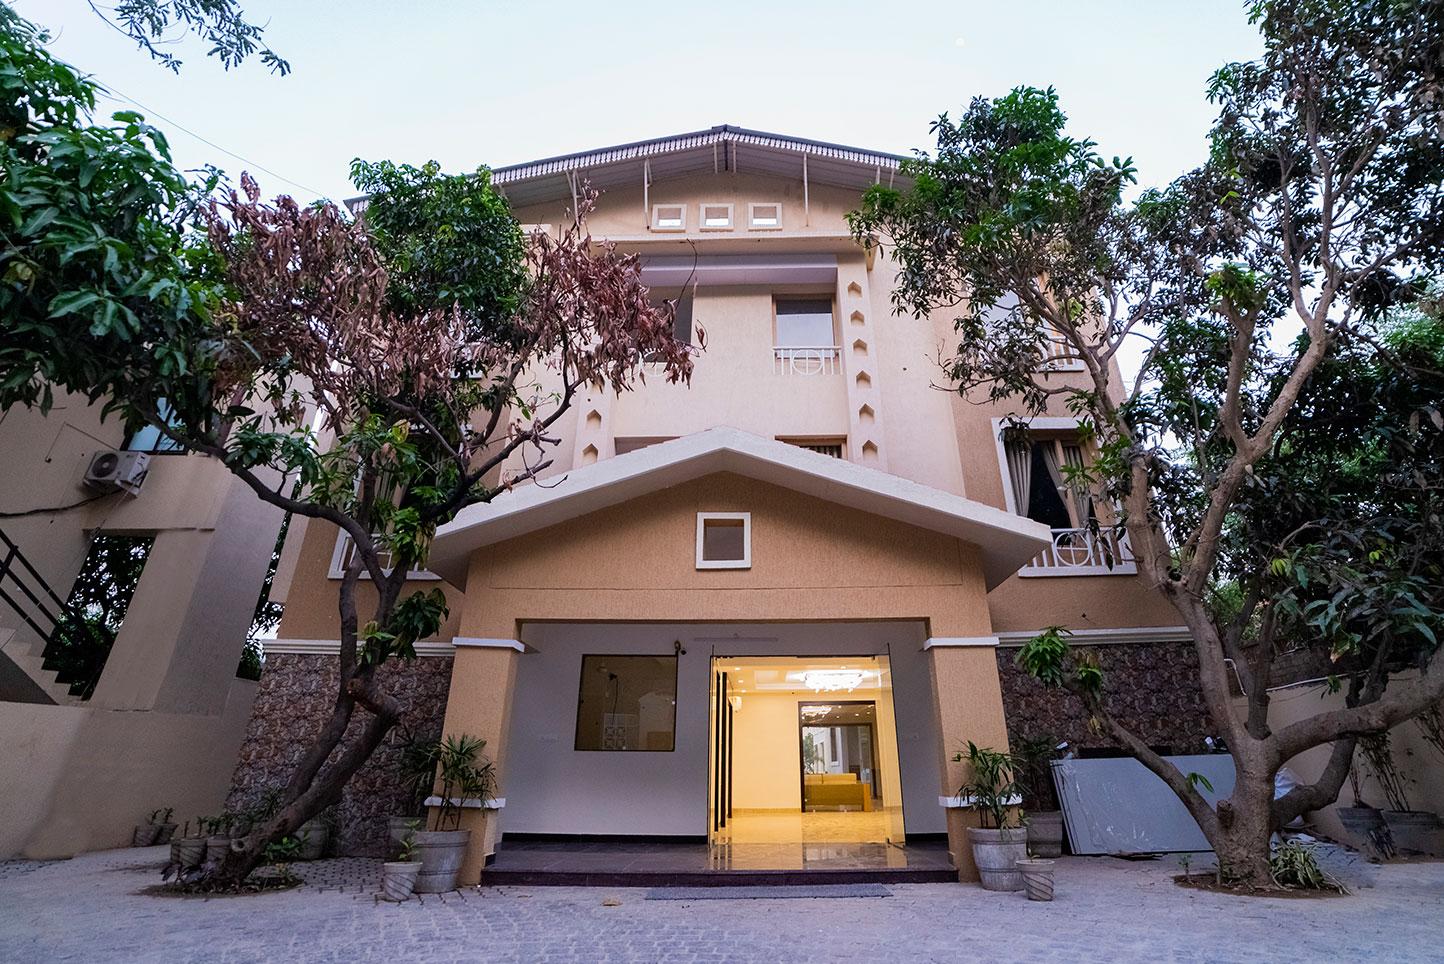 La Savanna resort